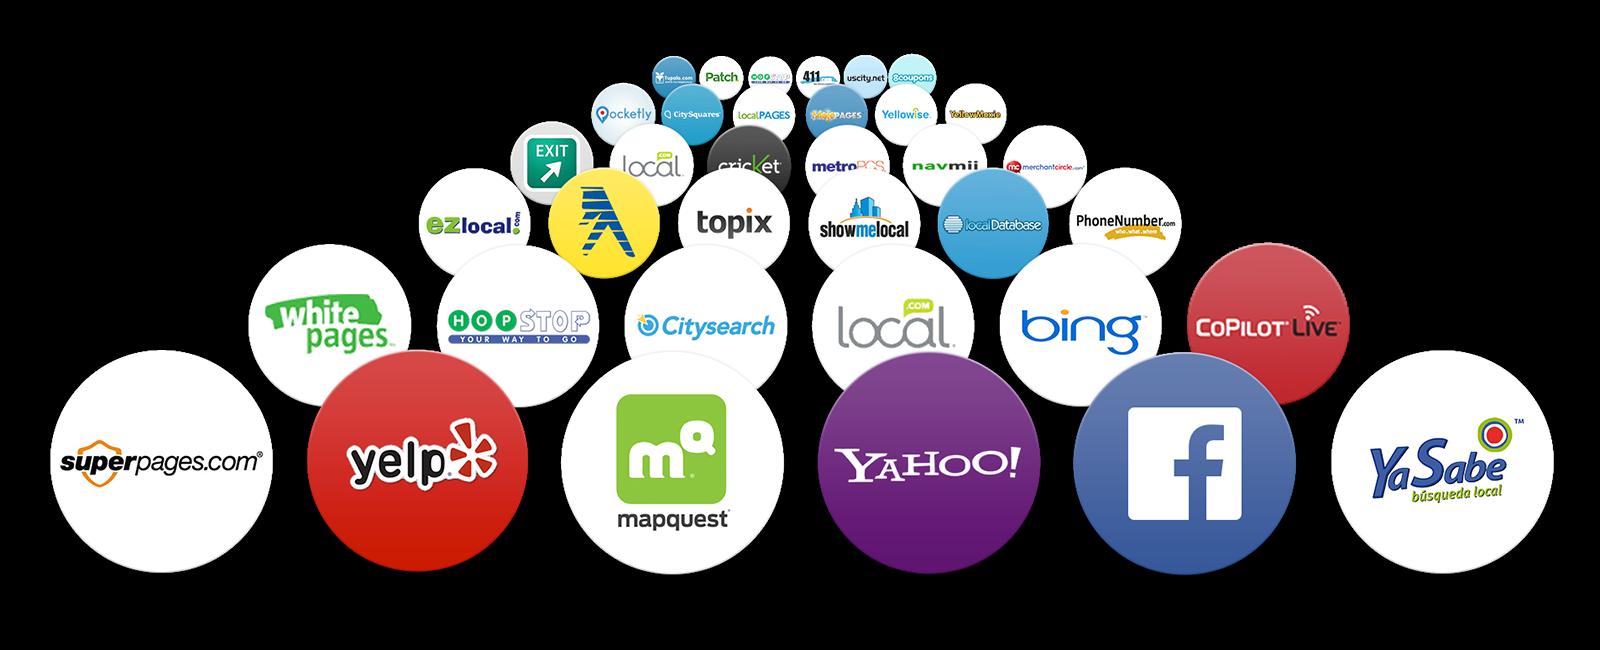 Ways to Improve Google My Business, Maps Ranking - SEO Kochi